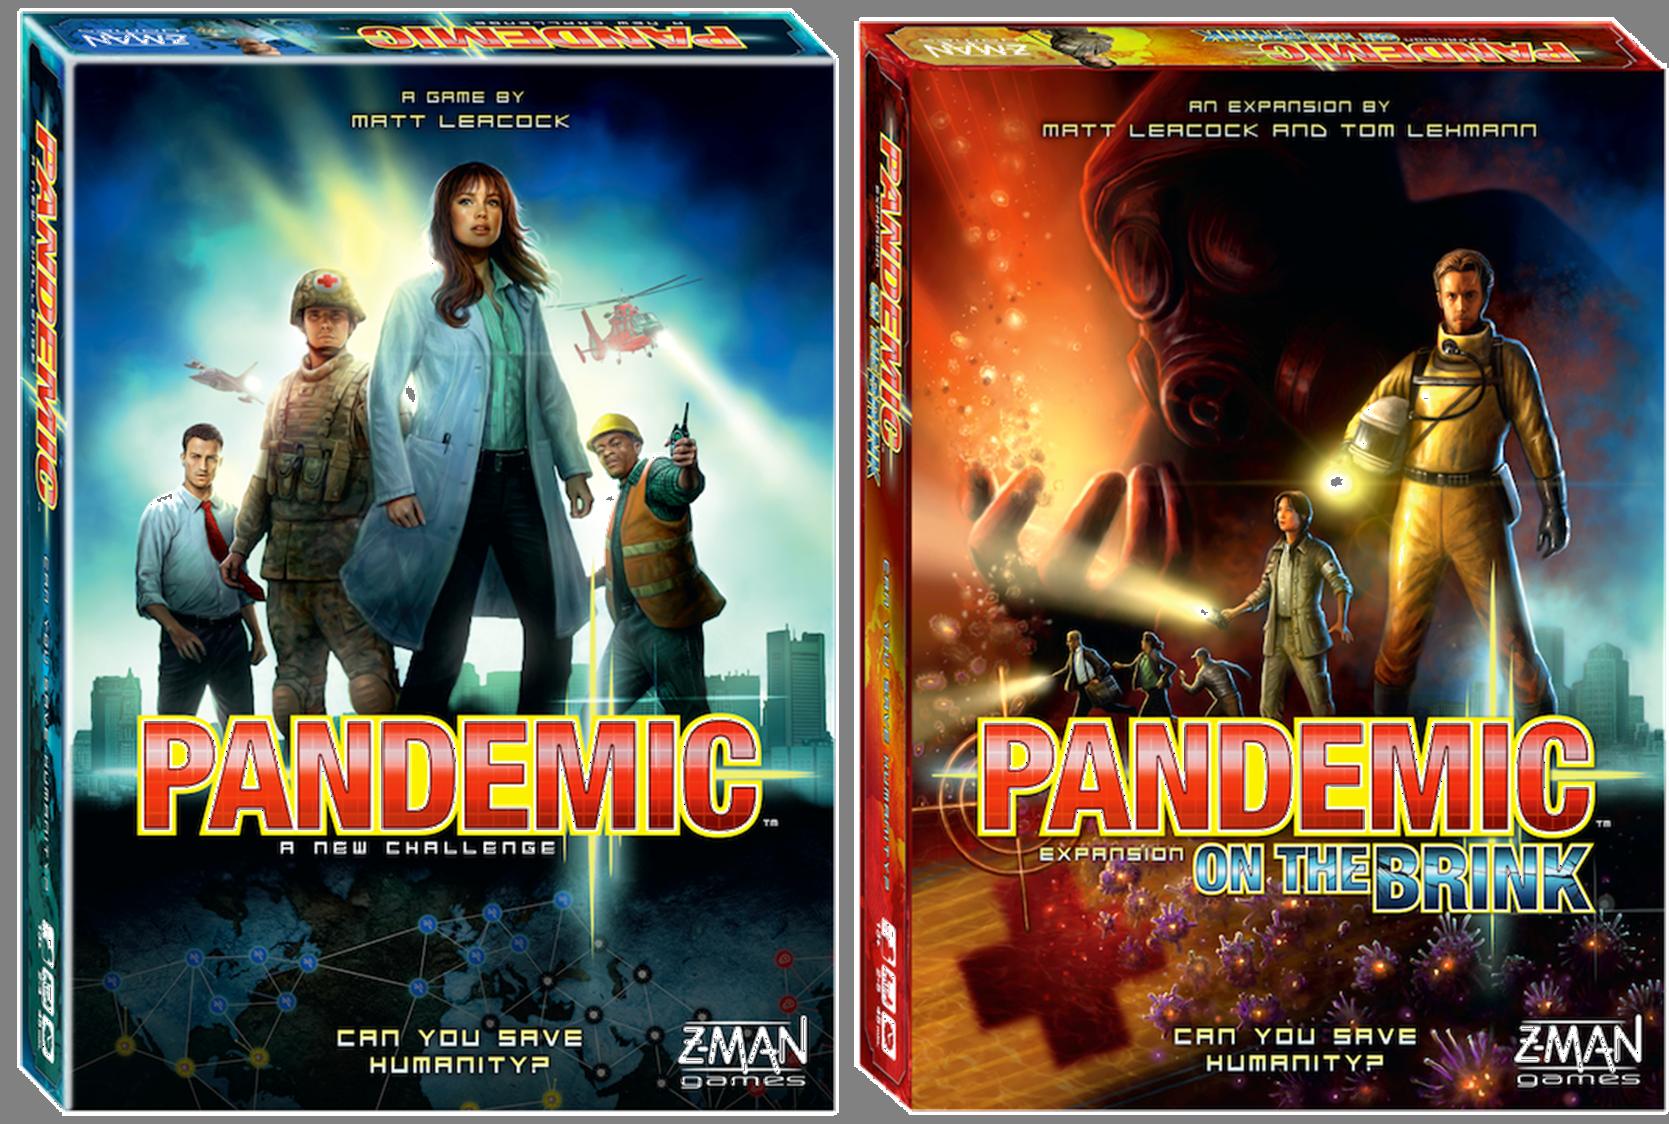 [FINALIZADA] Miercoles 21 de Mayo, Pandemic + Pandemic On the Brink! Pandemia-001-scatole